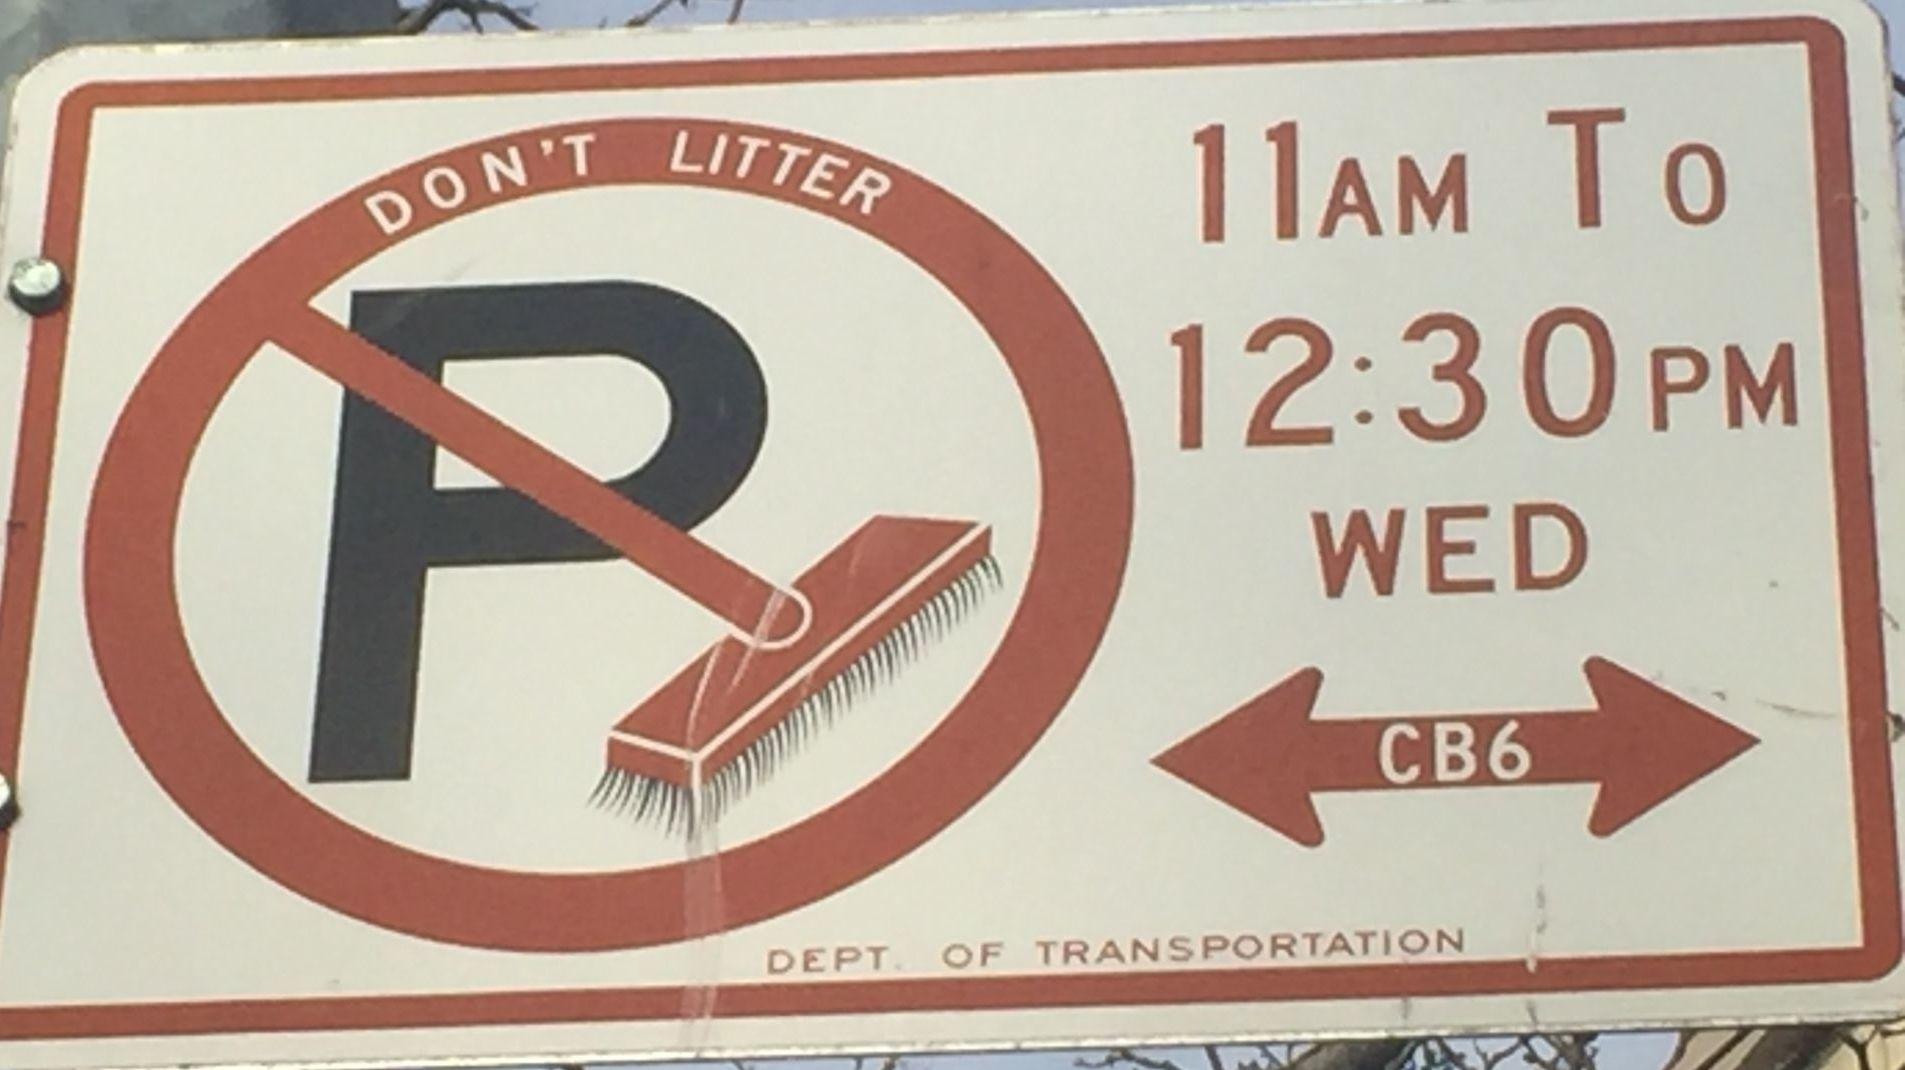 Holidays That Suspend Alternate Side Parking In Nyc Alternate Side Parking Suspension 2021